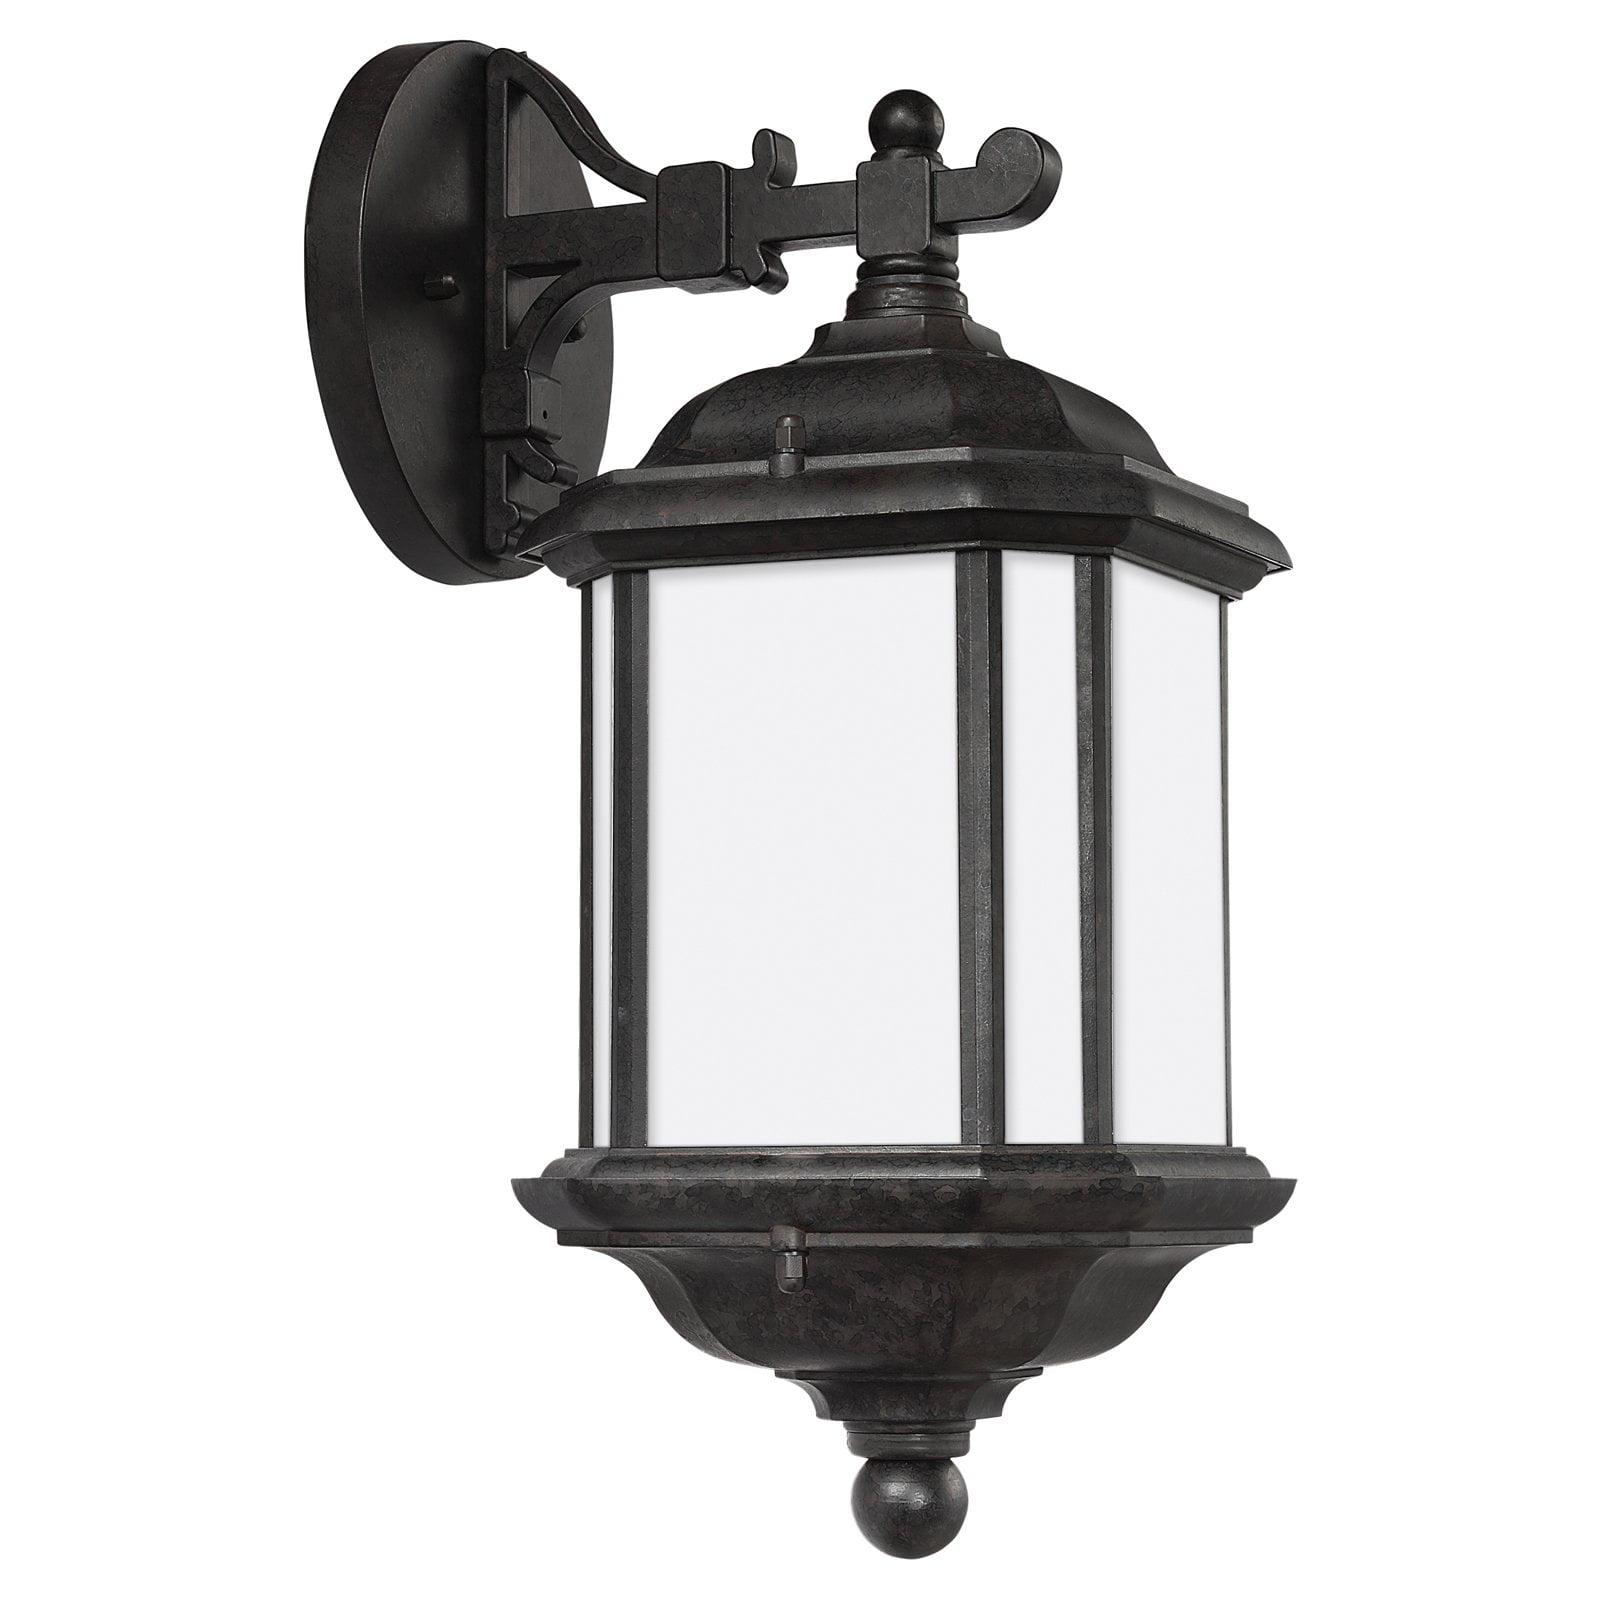 Sea Gull Lighting Kent 84530 Outdoor Wall Lantern